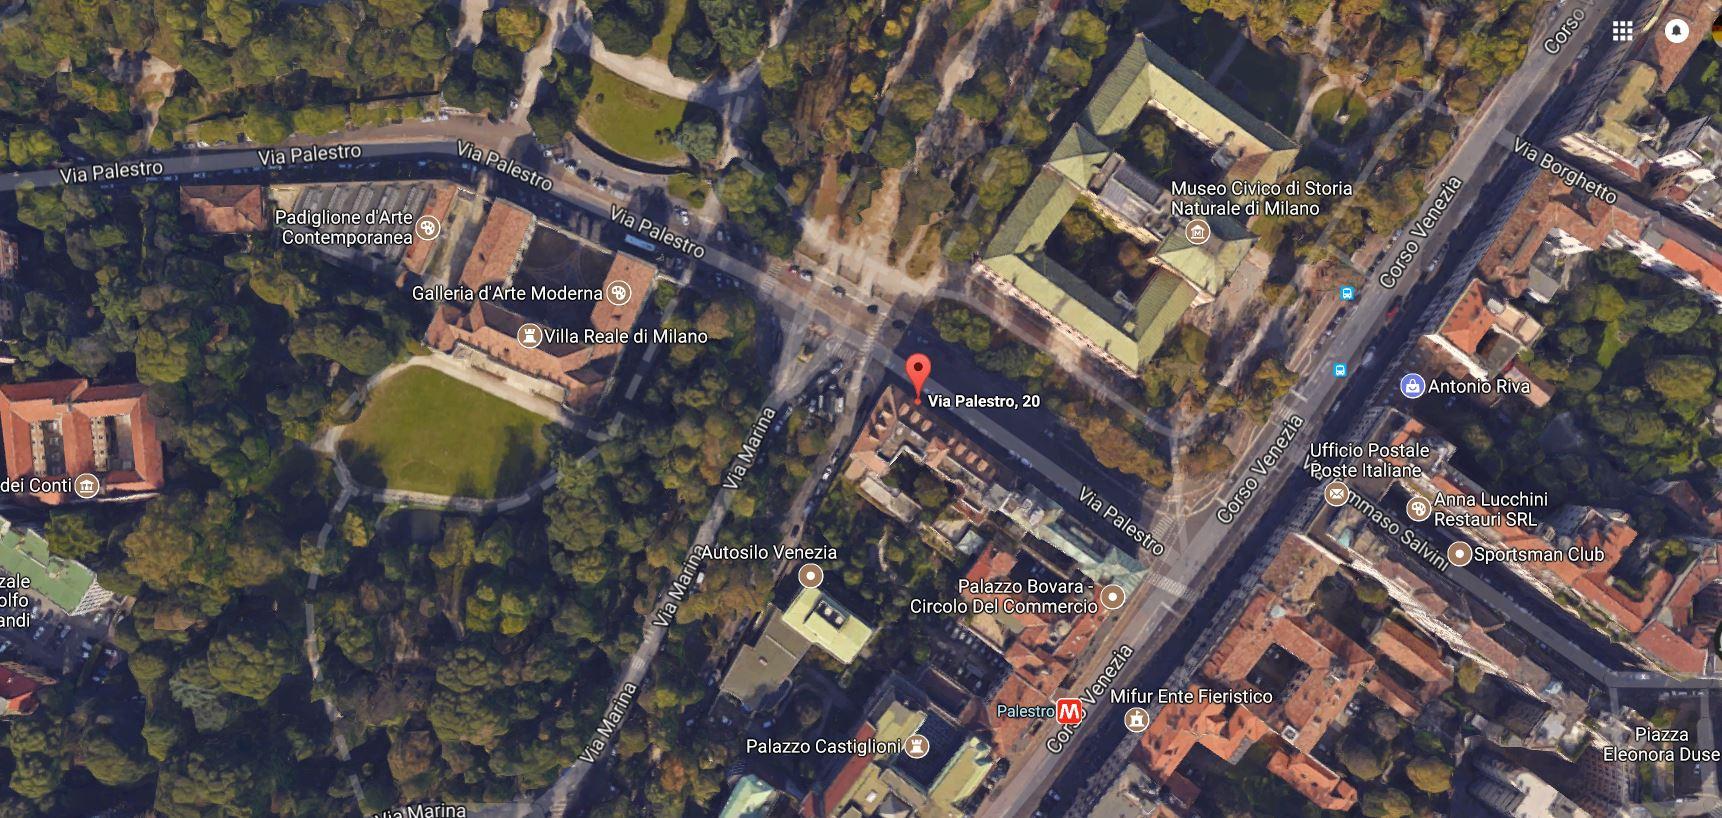 Mappa-Studio-Via_Palestro-20-Milano